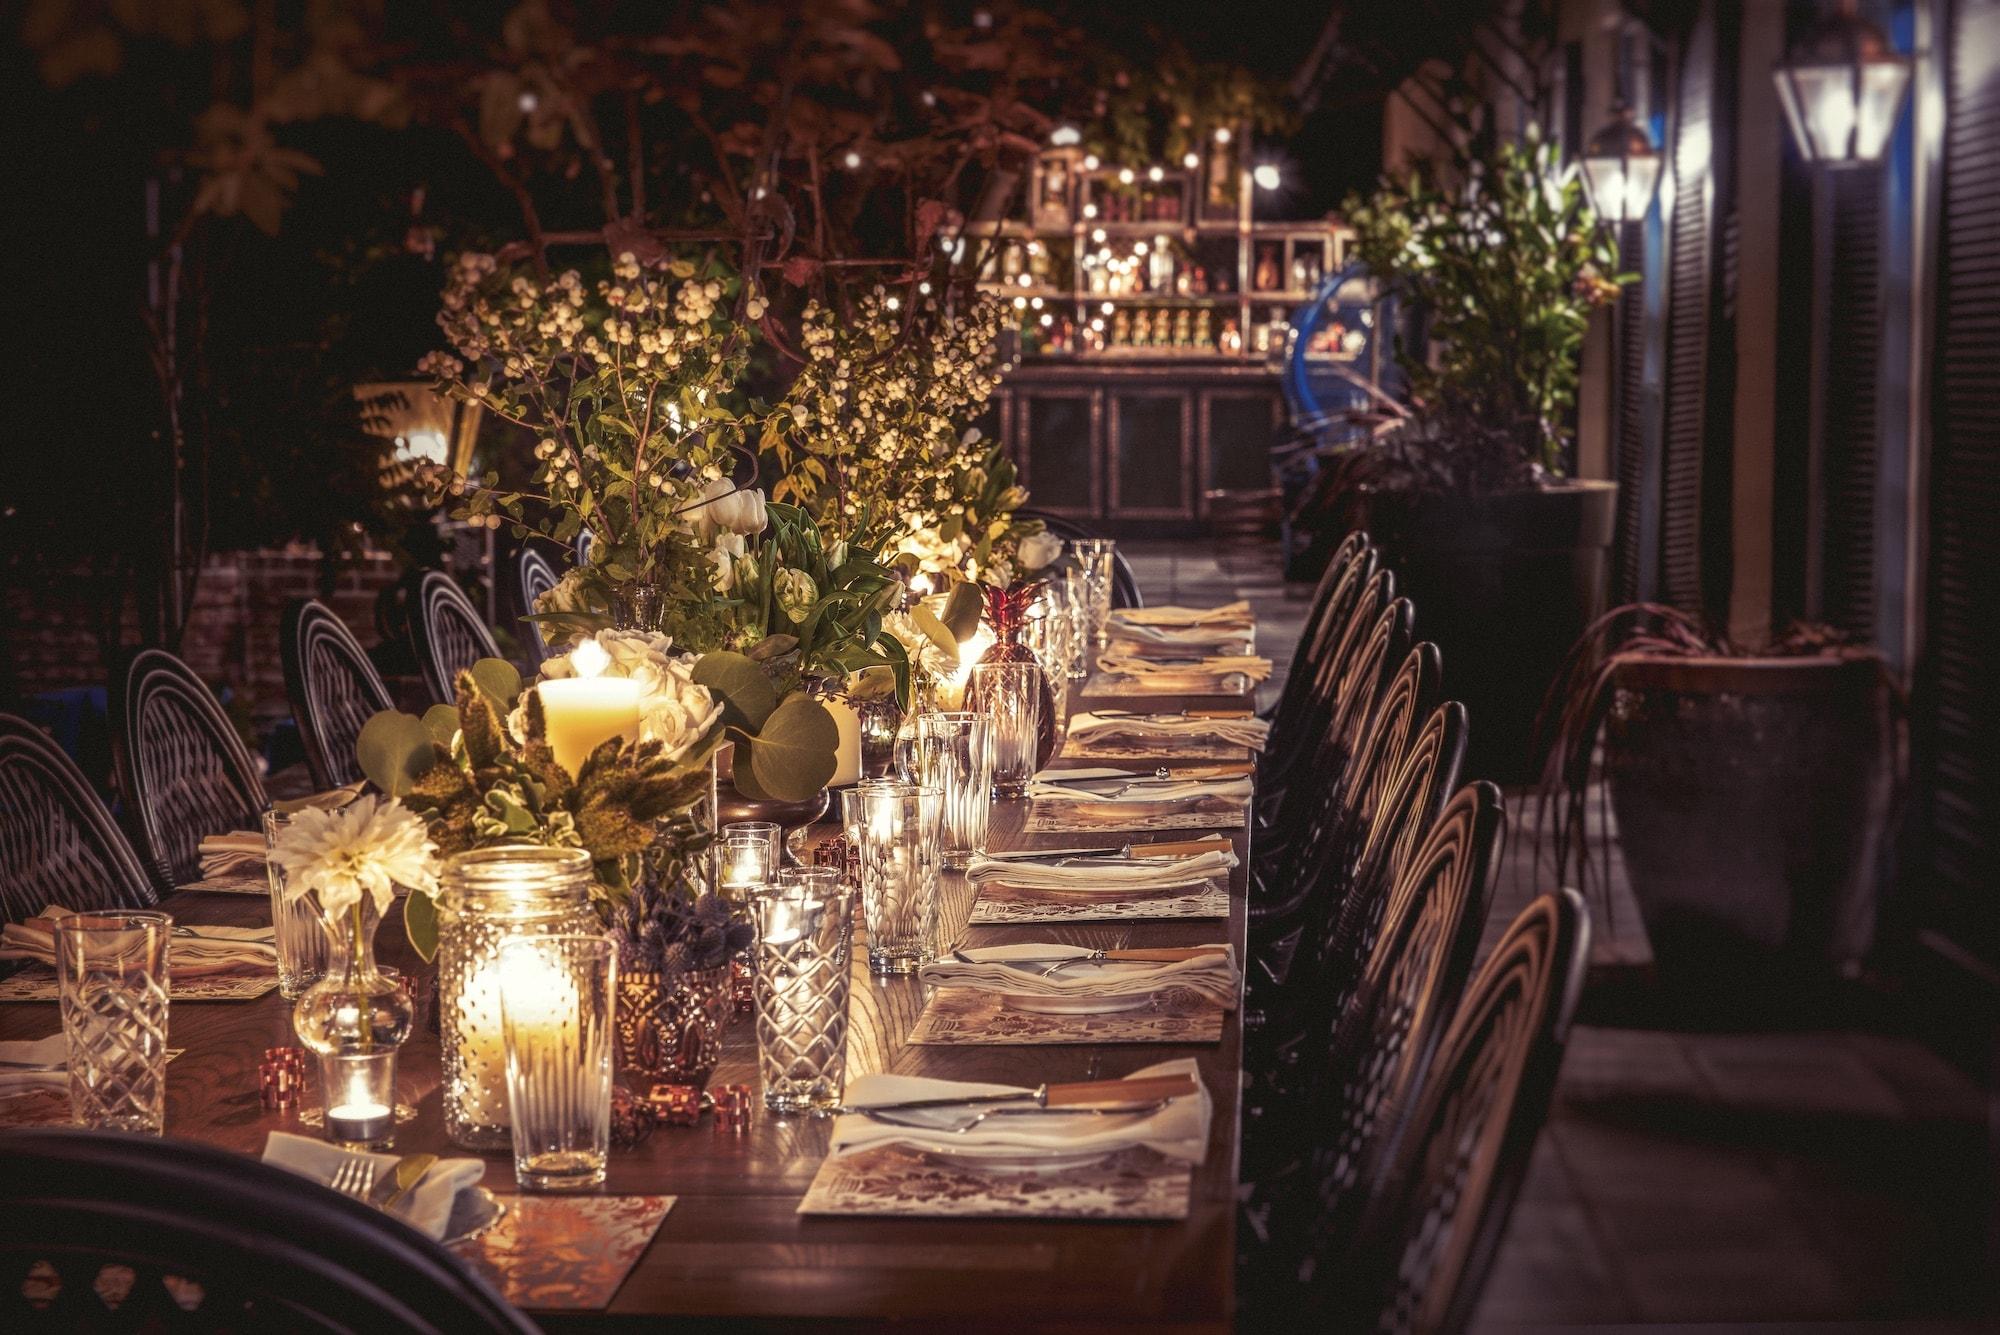 Veranda Bar and Dinner Table at the Elyx House LA